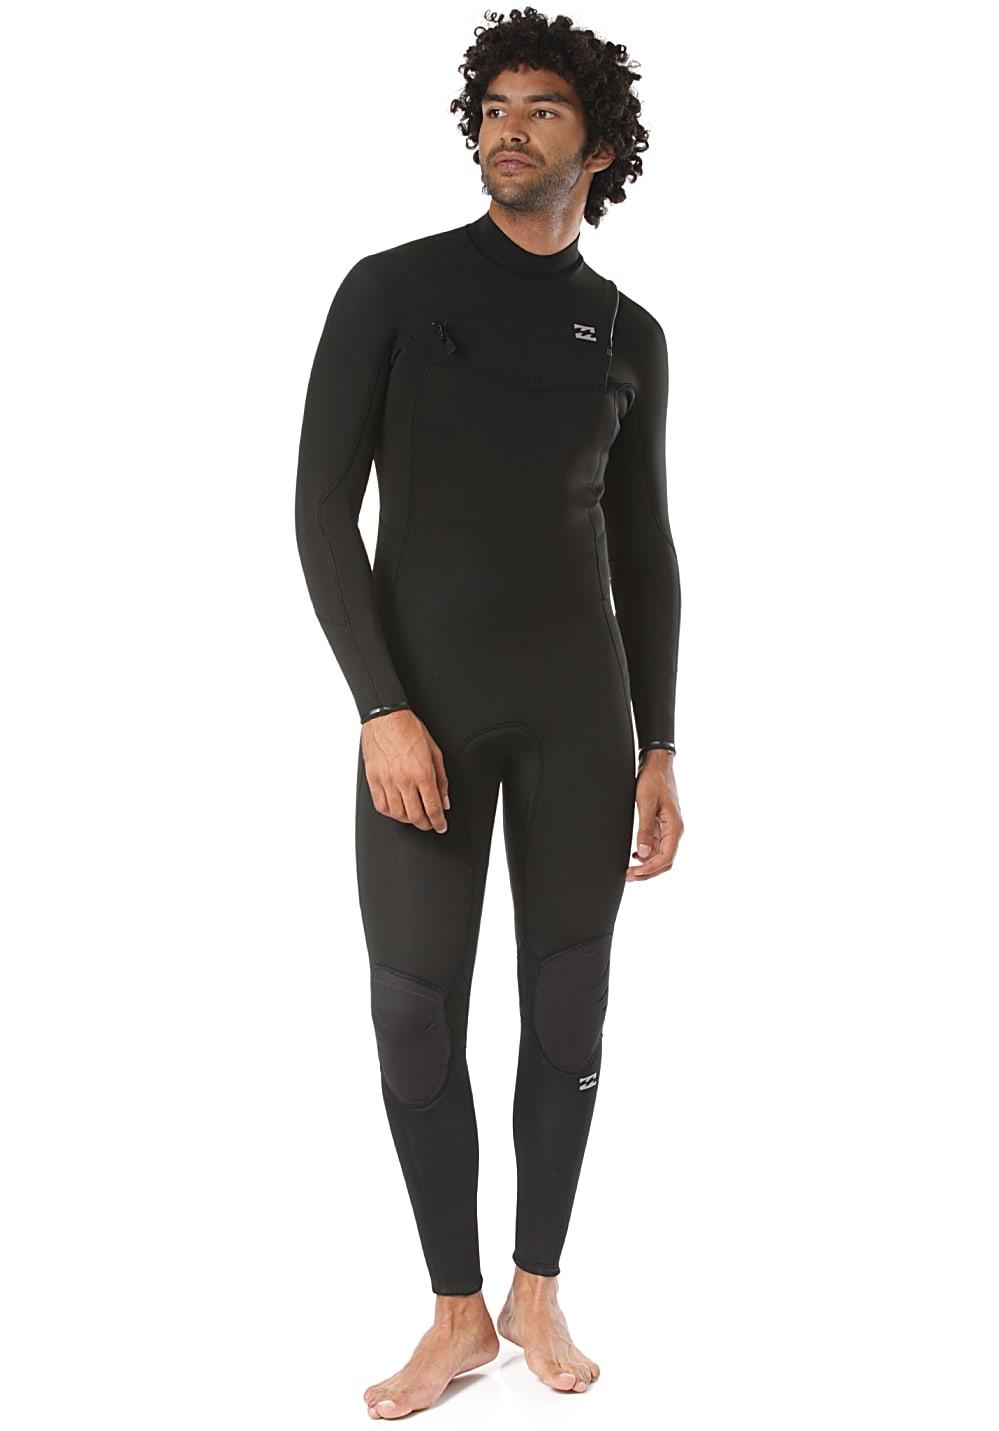 Billabong Furnace Absolute 4/3 Chest Zip GBS Full Suit